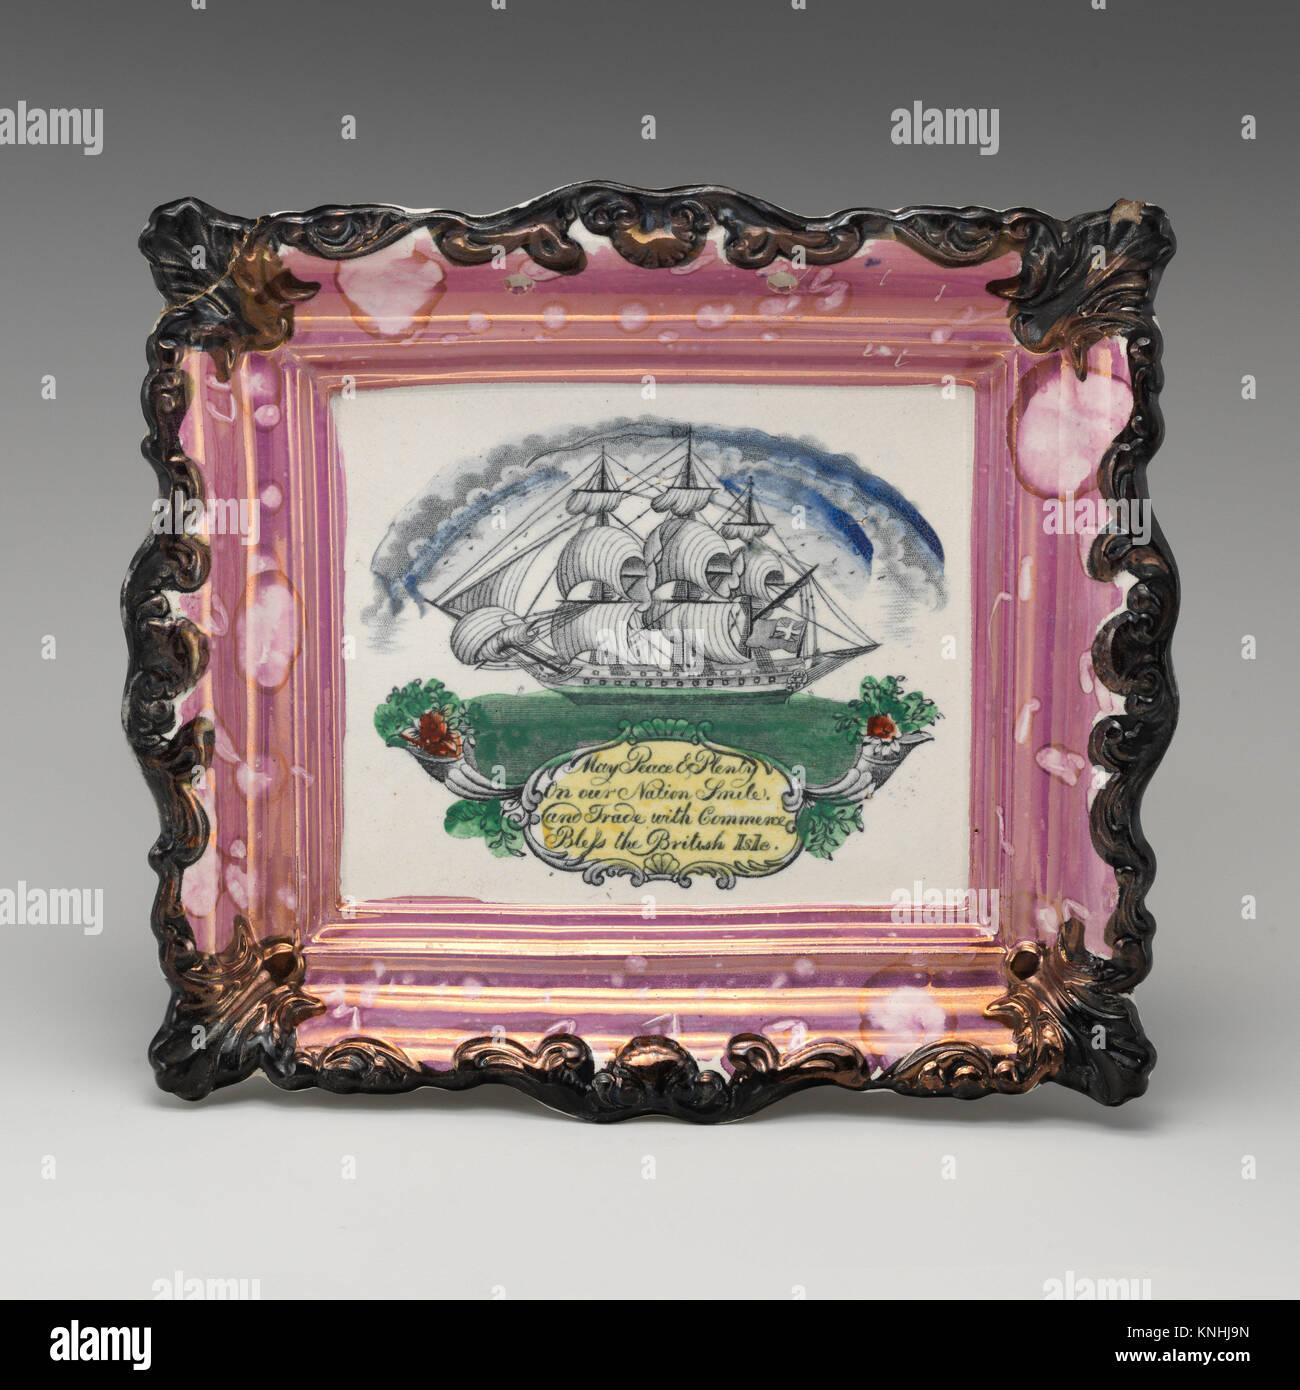 Peace and Plenty. Factory: Sunderland; Date: early 19th century; Culture: British, Sunderland, Yorkshire; Medium: - Stock Image